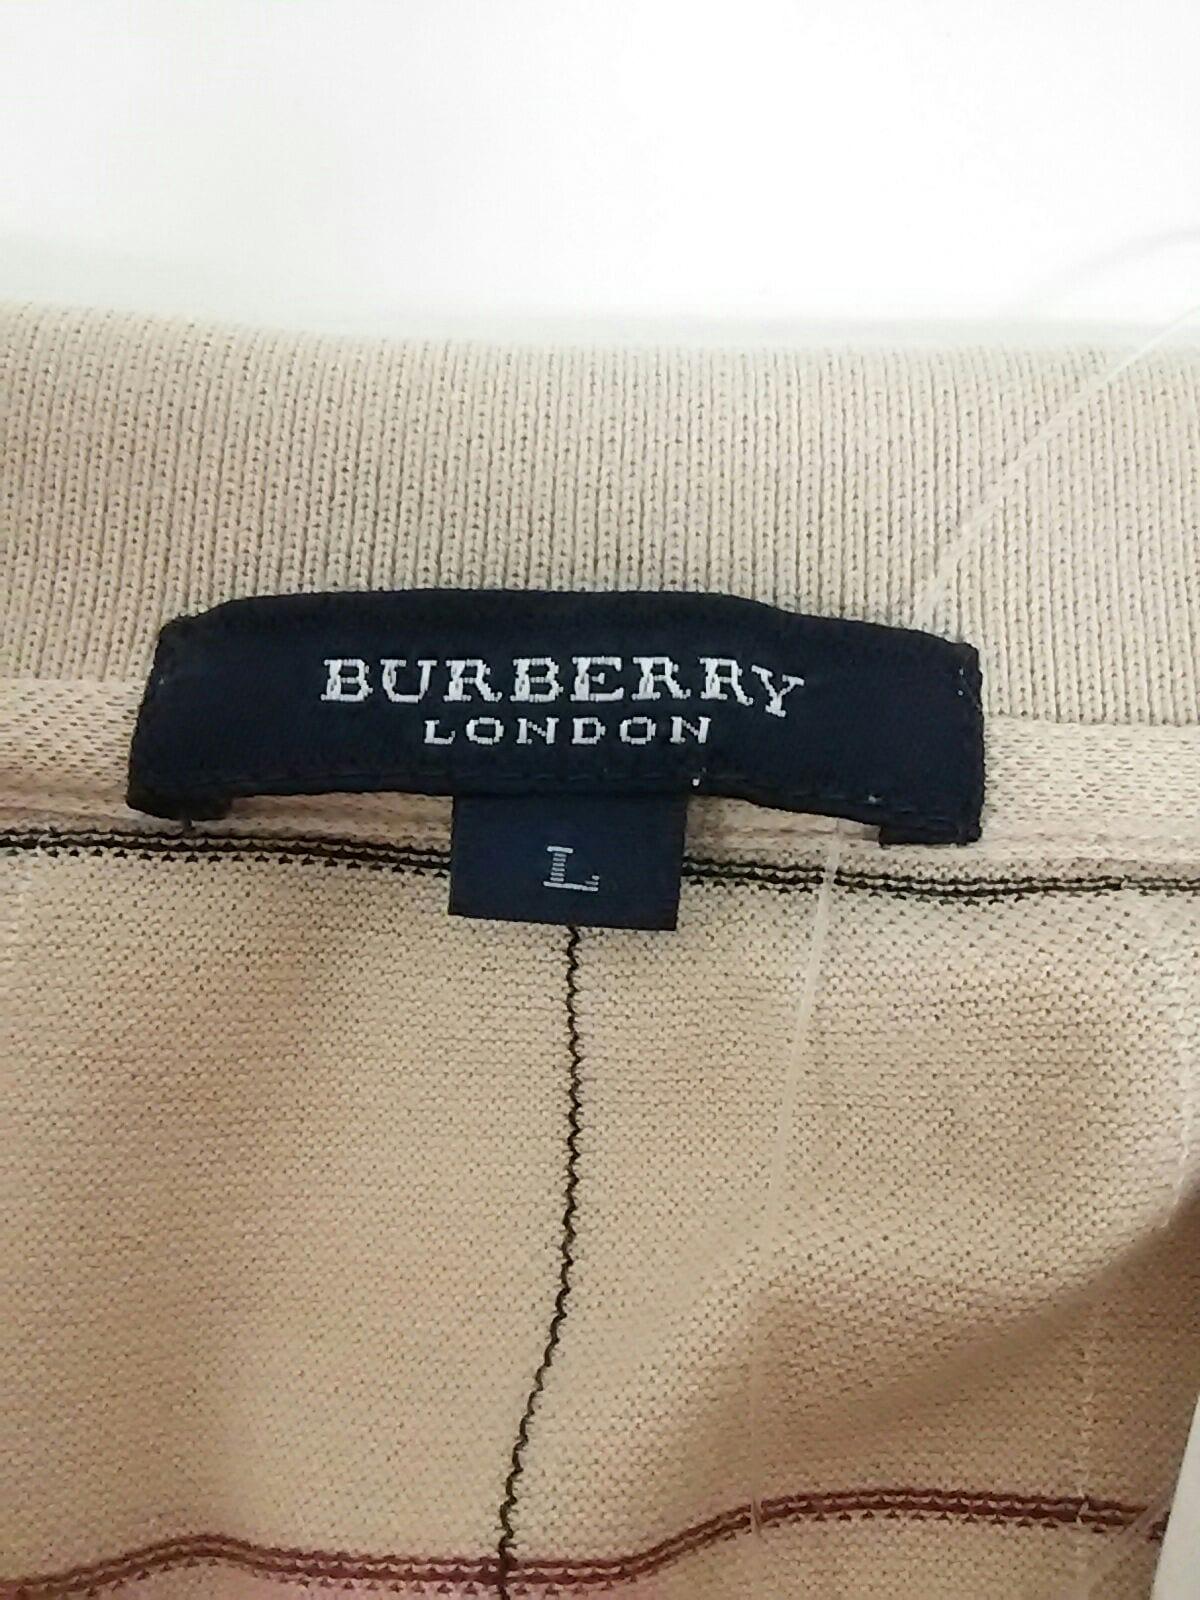 Burberry LONDON(バーバリーロンドン)のポロシャツ